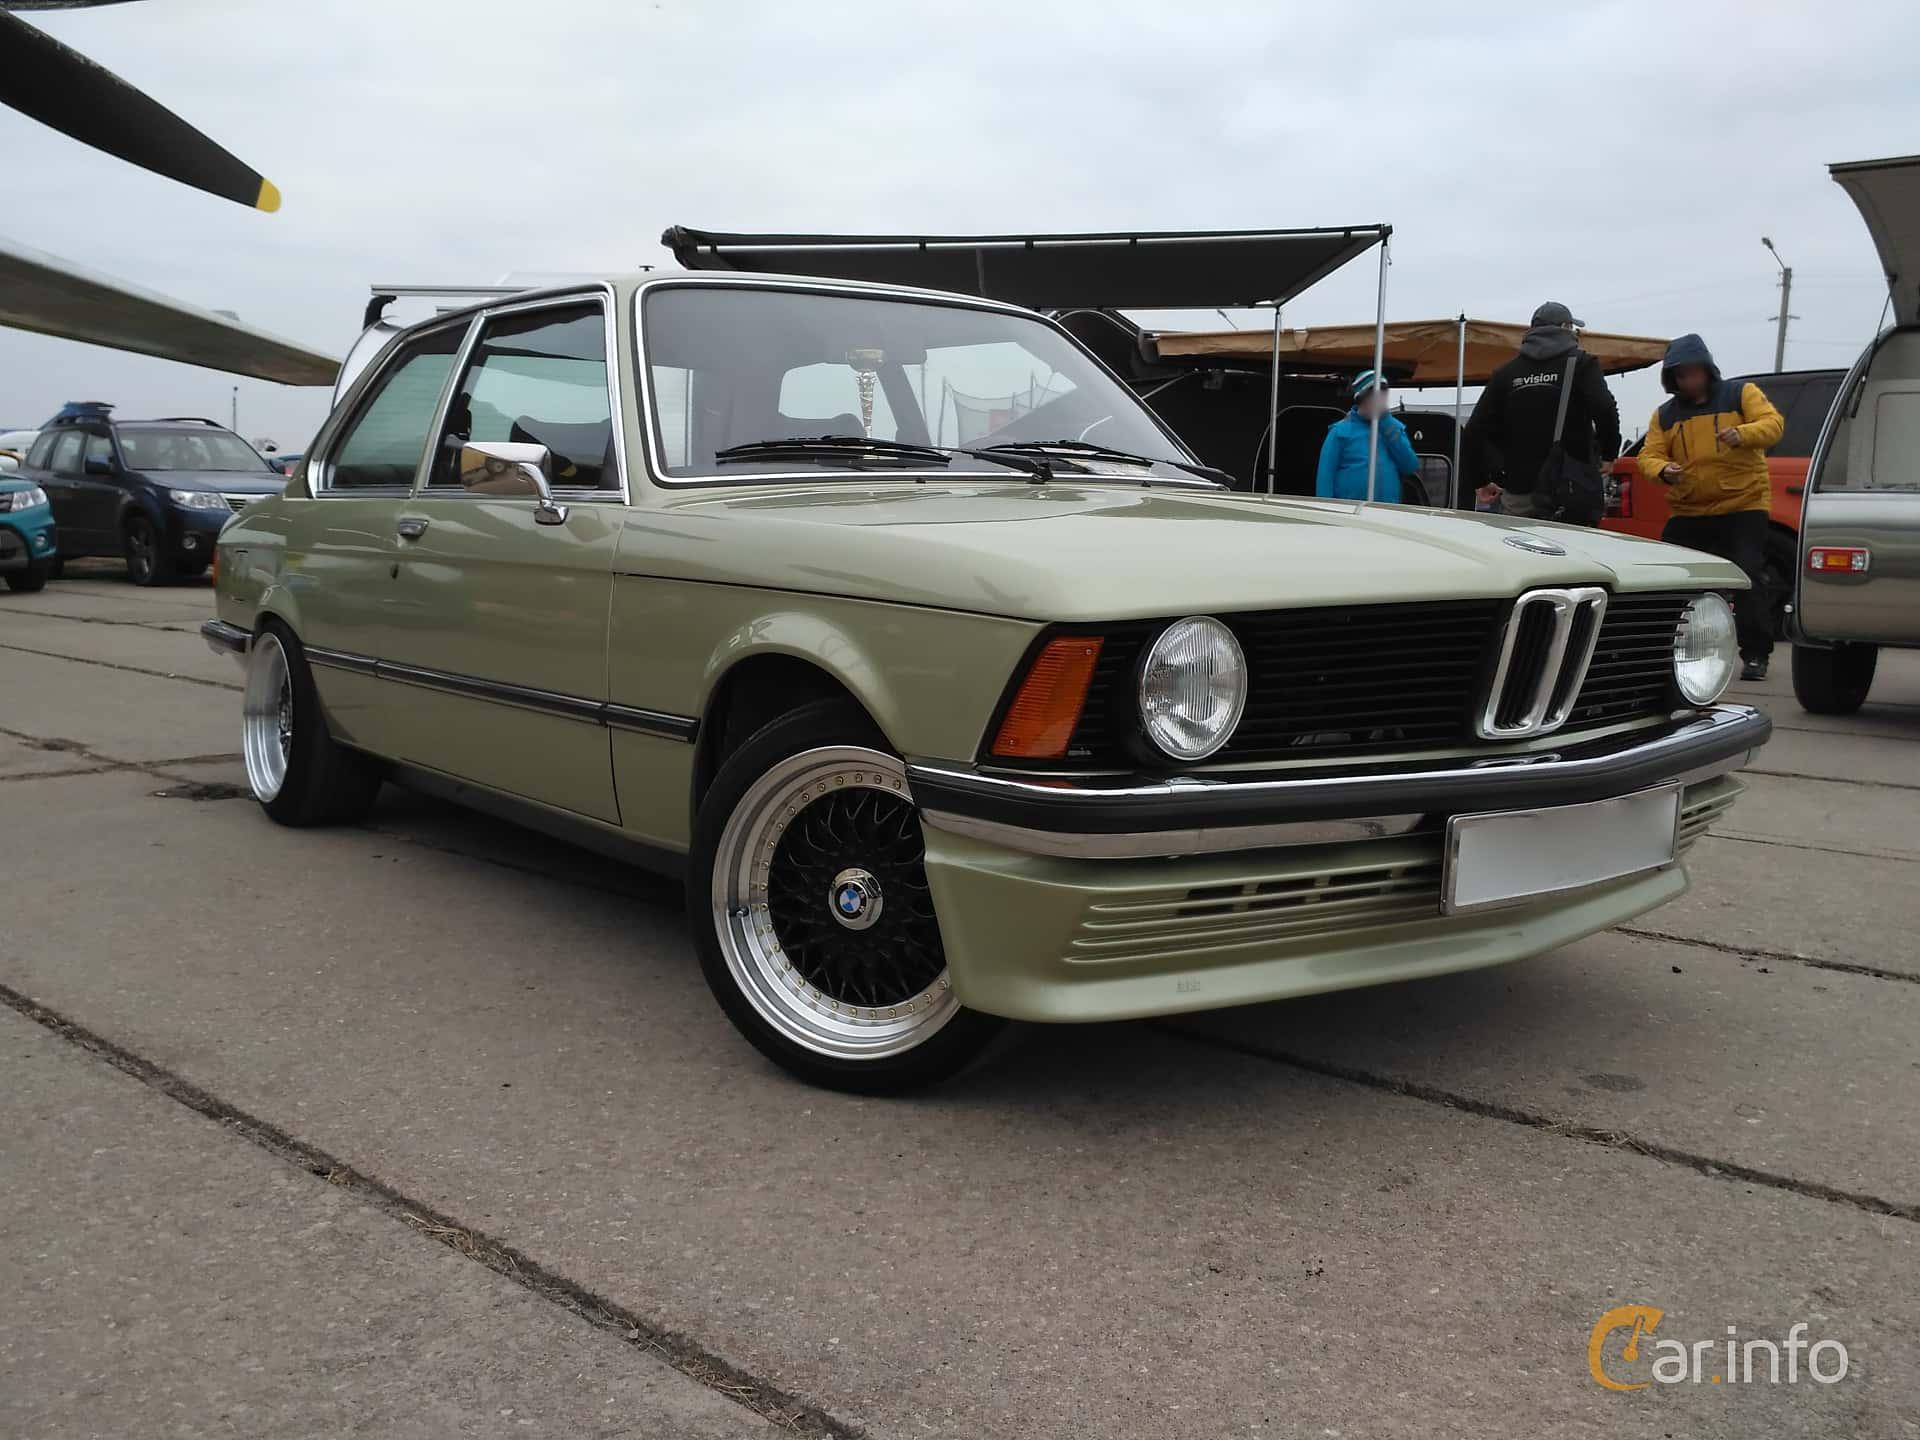 Bmw 316 1978 - The Best Famous BMW 2017